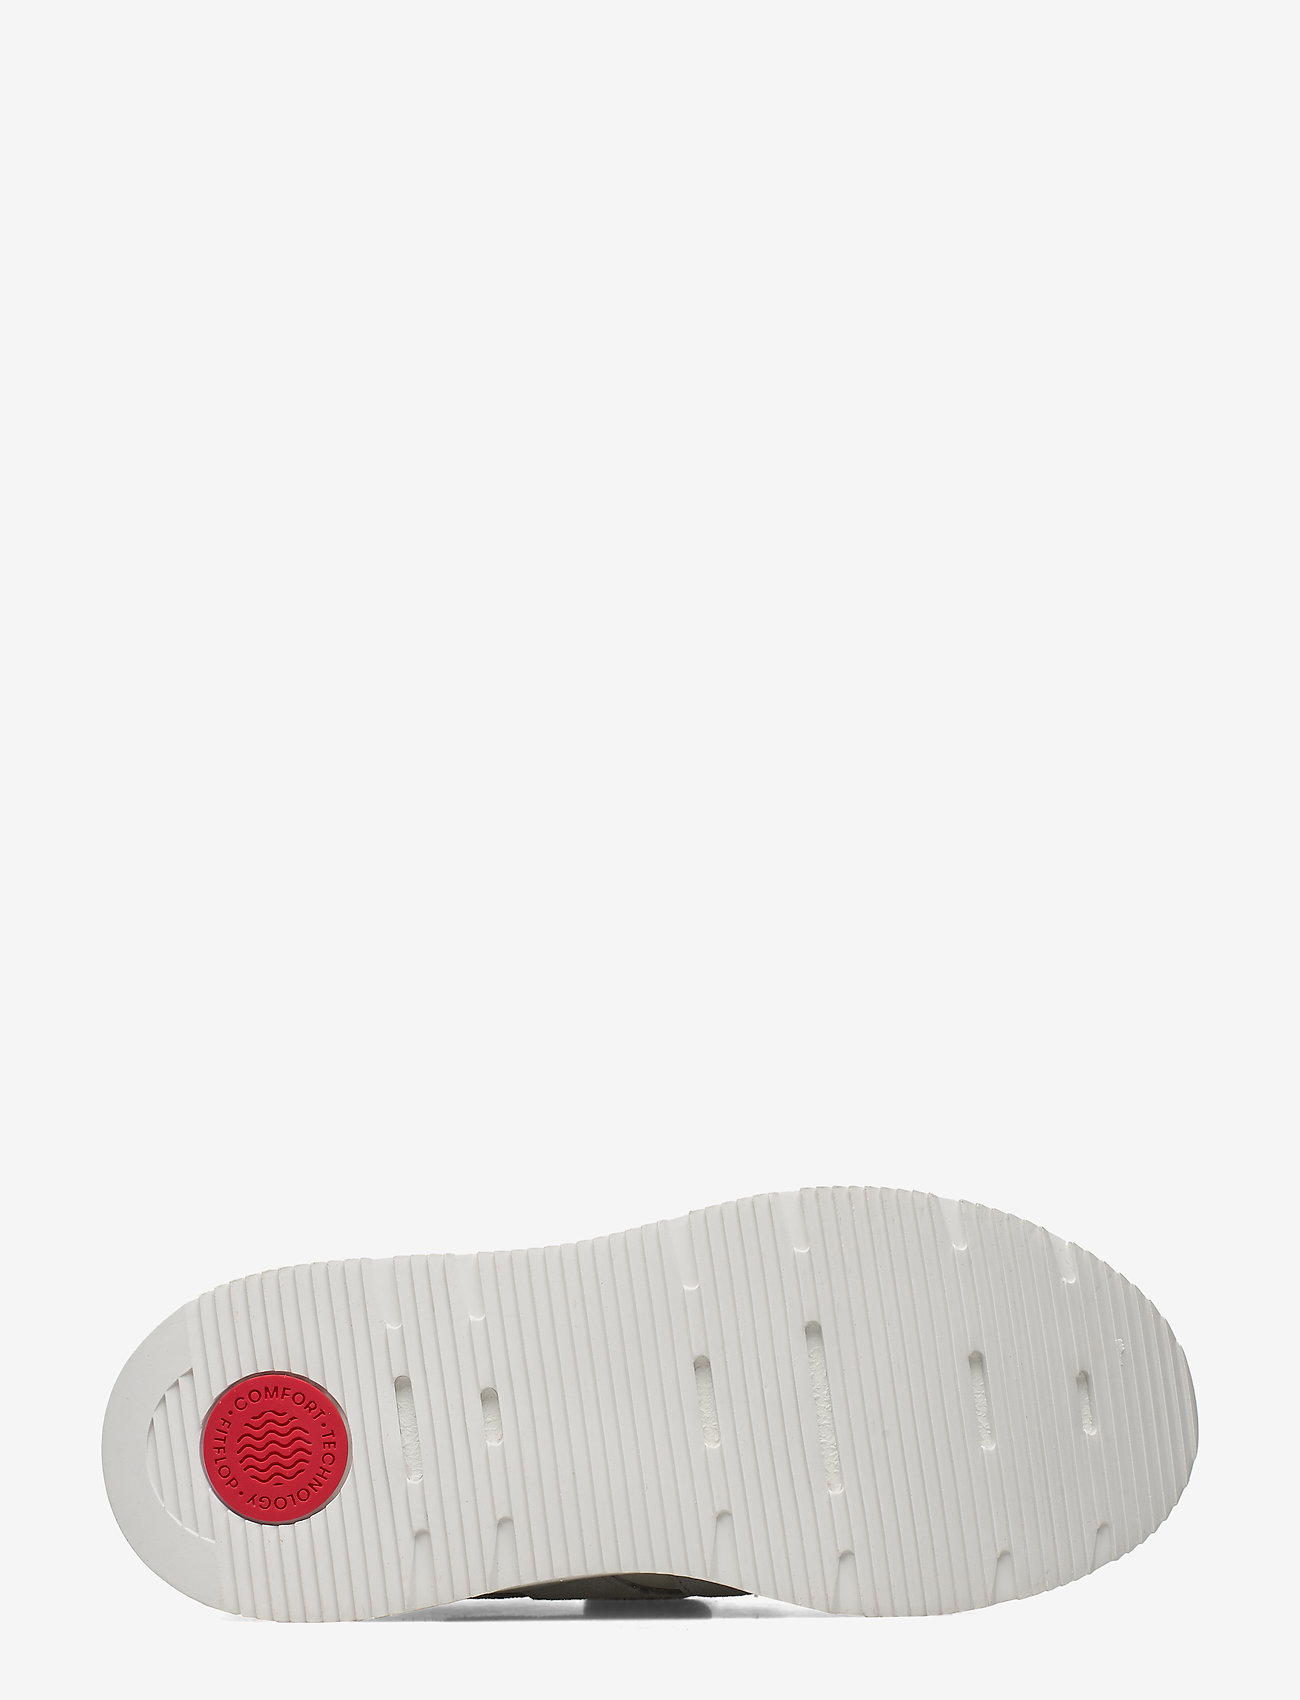 Carita Sneakers (Urban White) - FitFlop